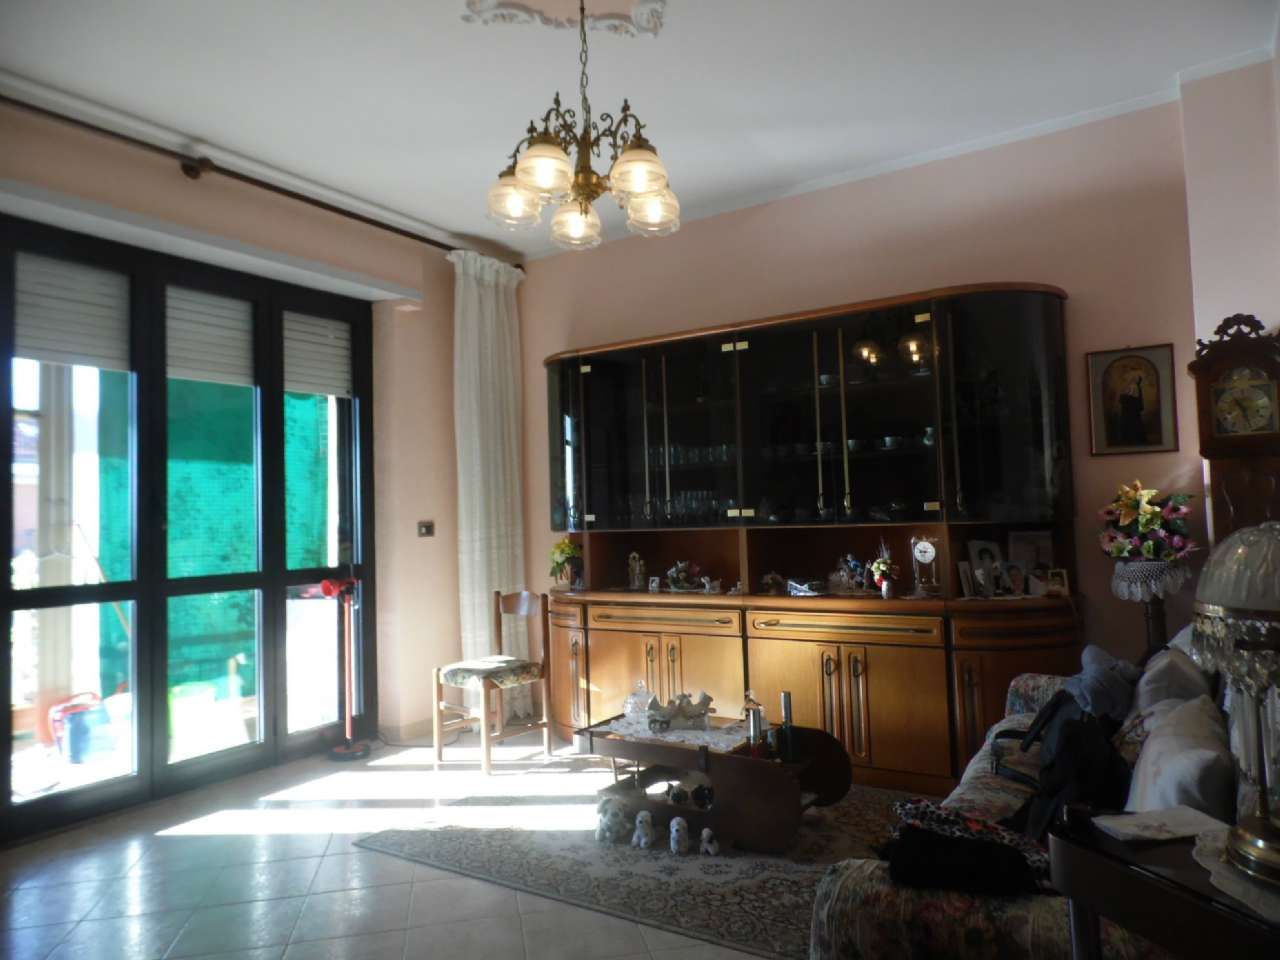 Borgaro Torinese Borgaro Torinese Vendita APPARTAMENTO , cercare appartamento in vendita torino